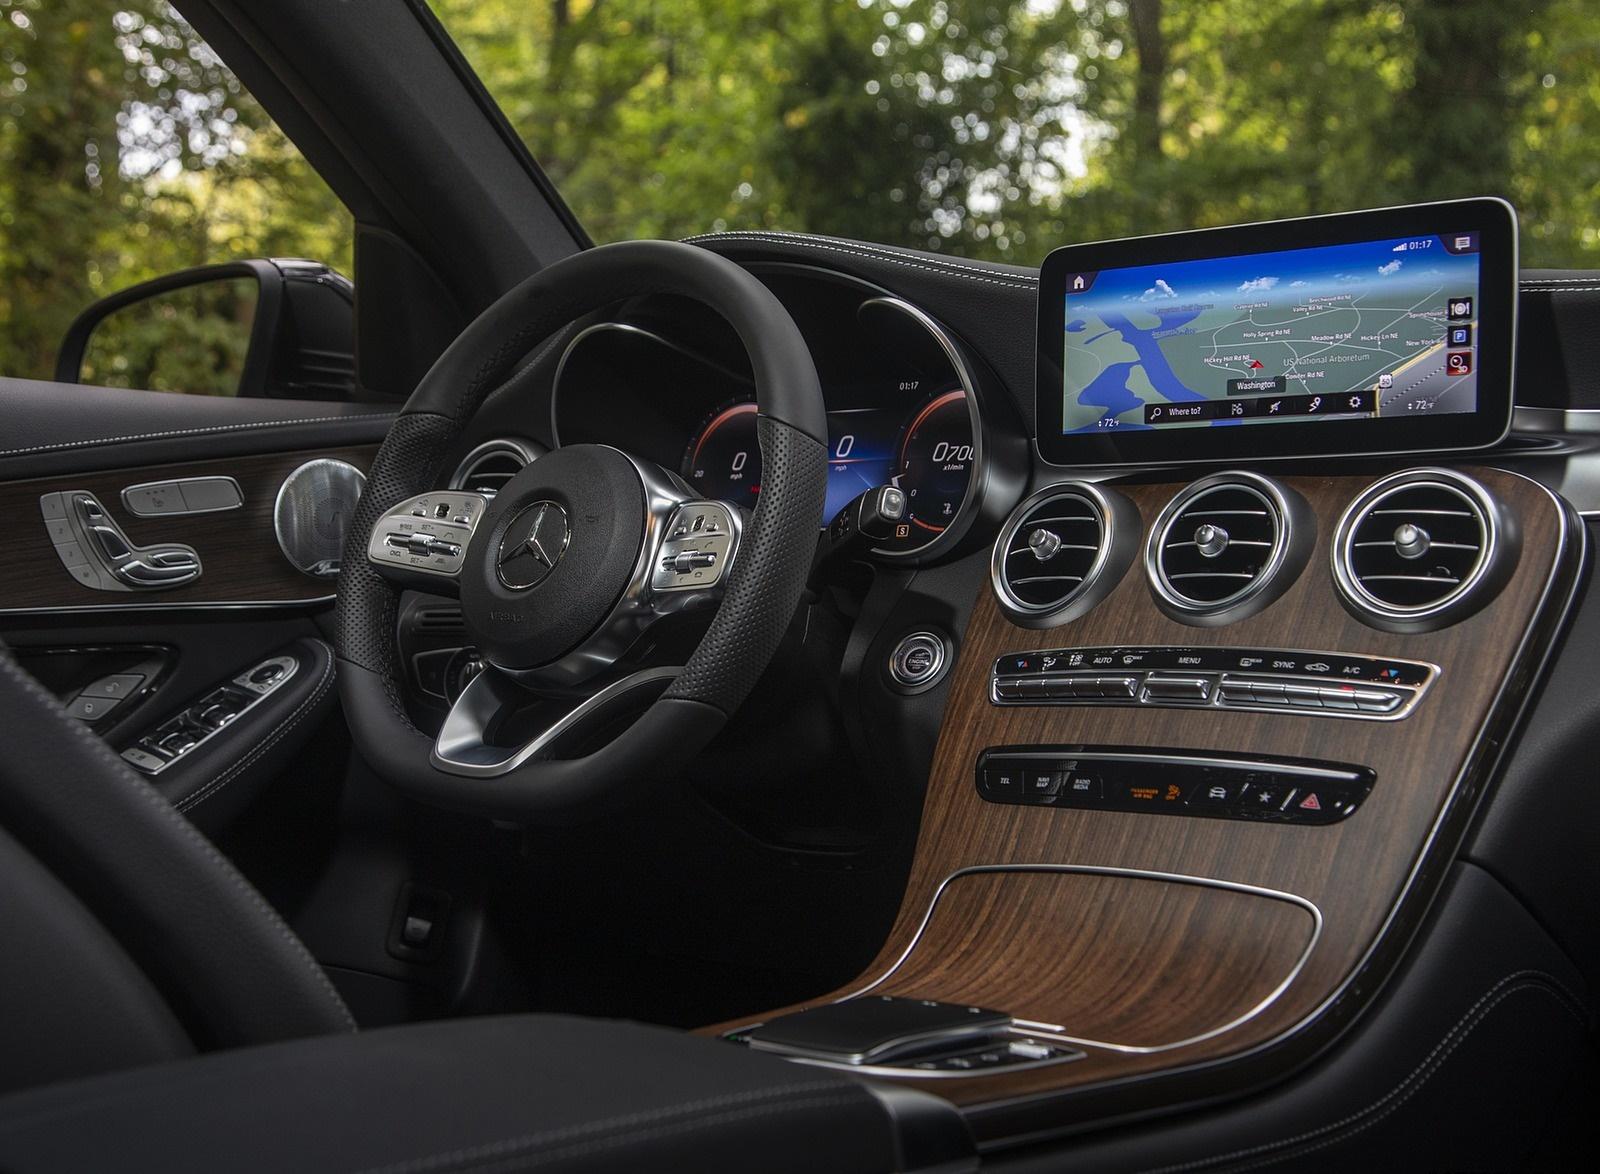 2020 Mercedes-Benz GLC 300 (US-Spec) Interior Wallpapers #18 of 62